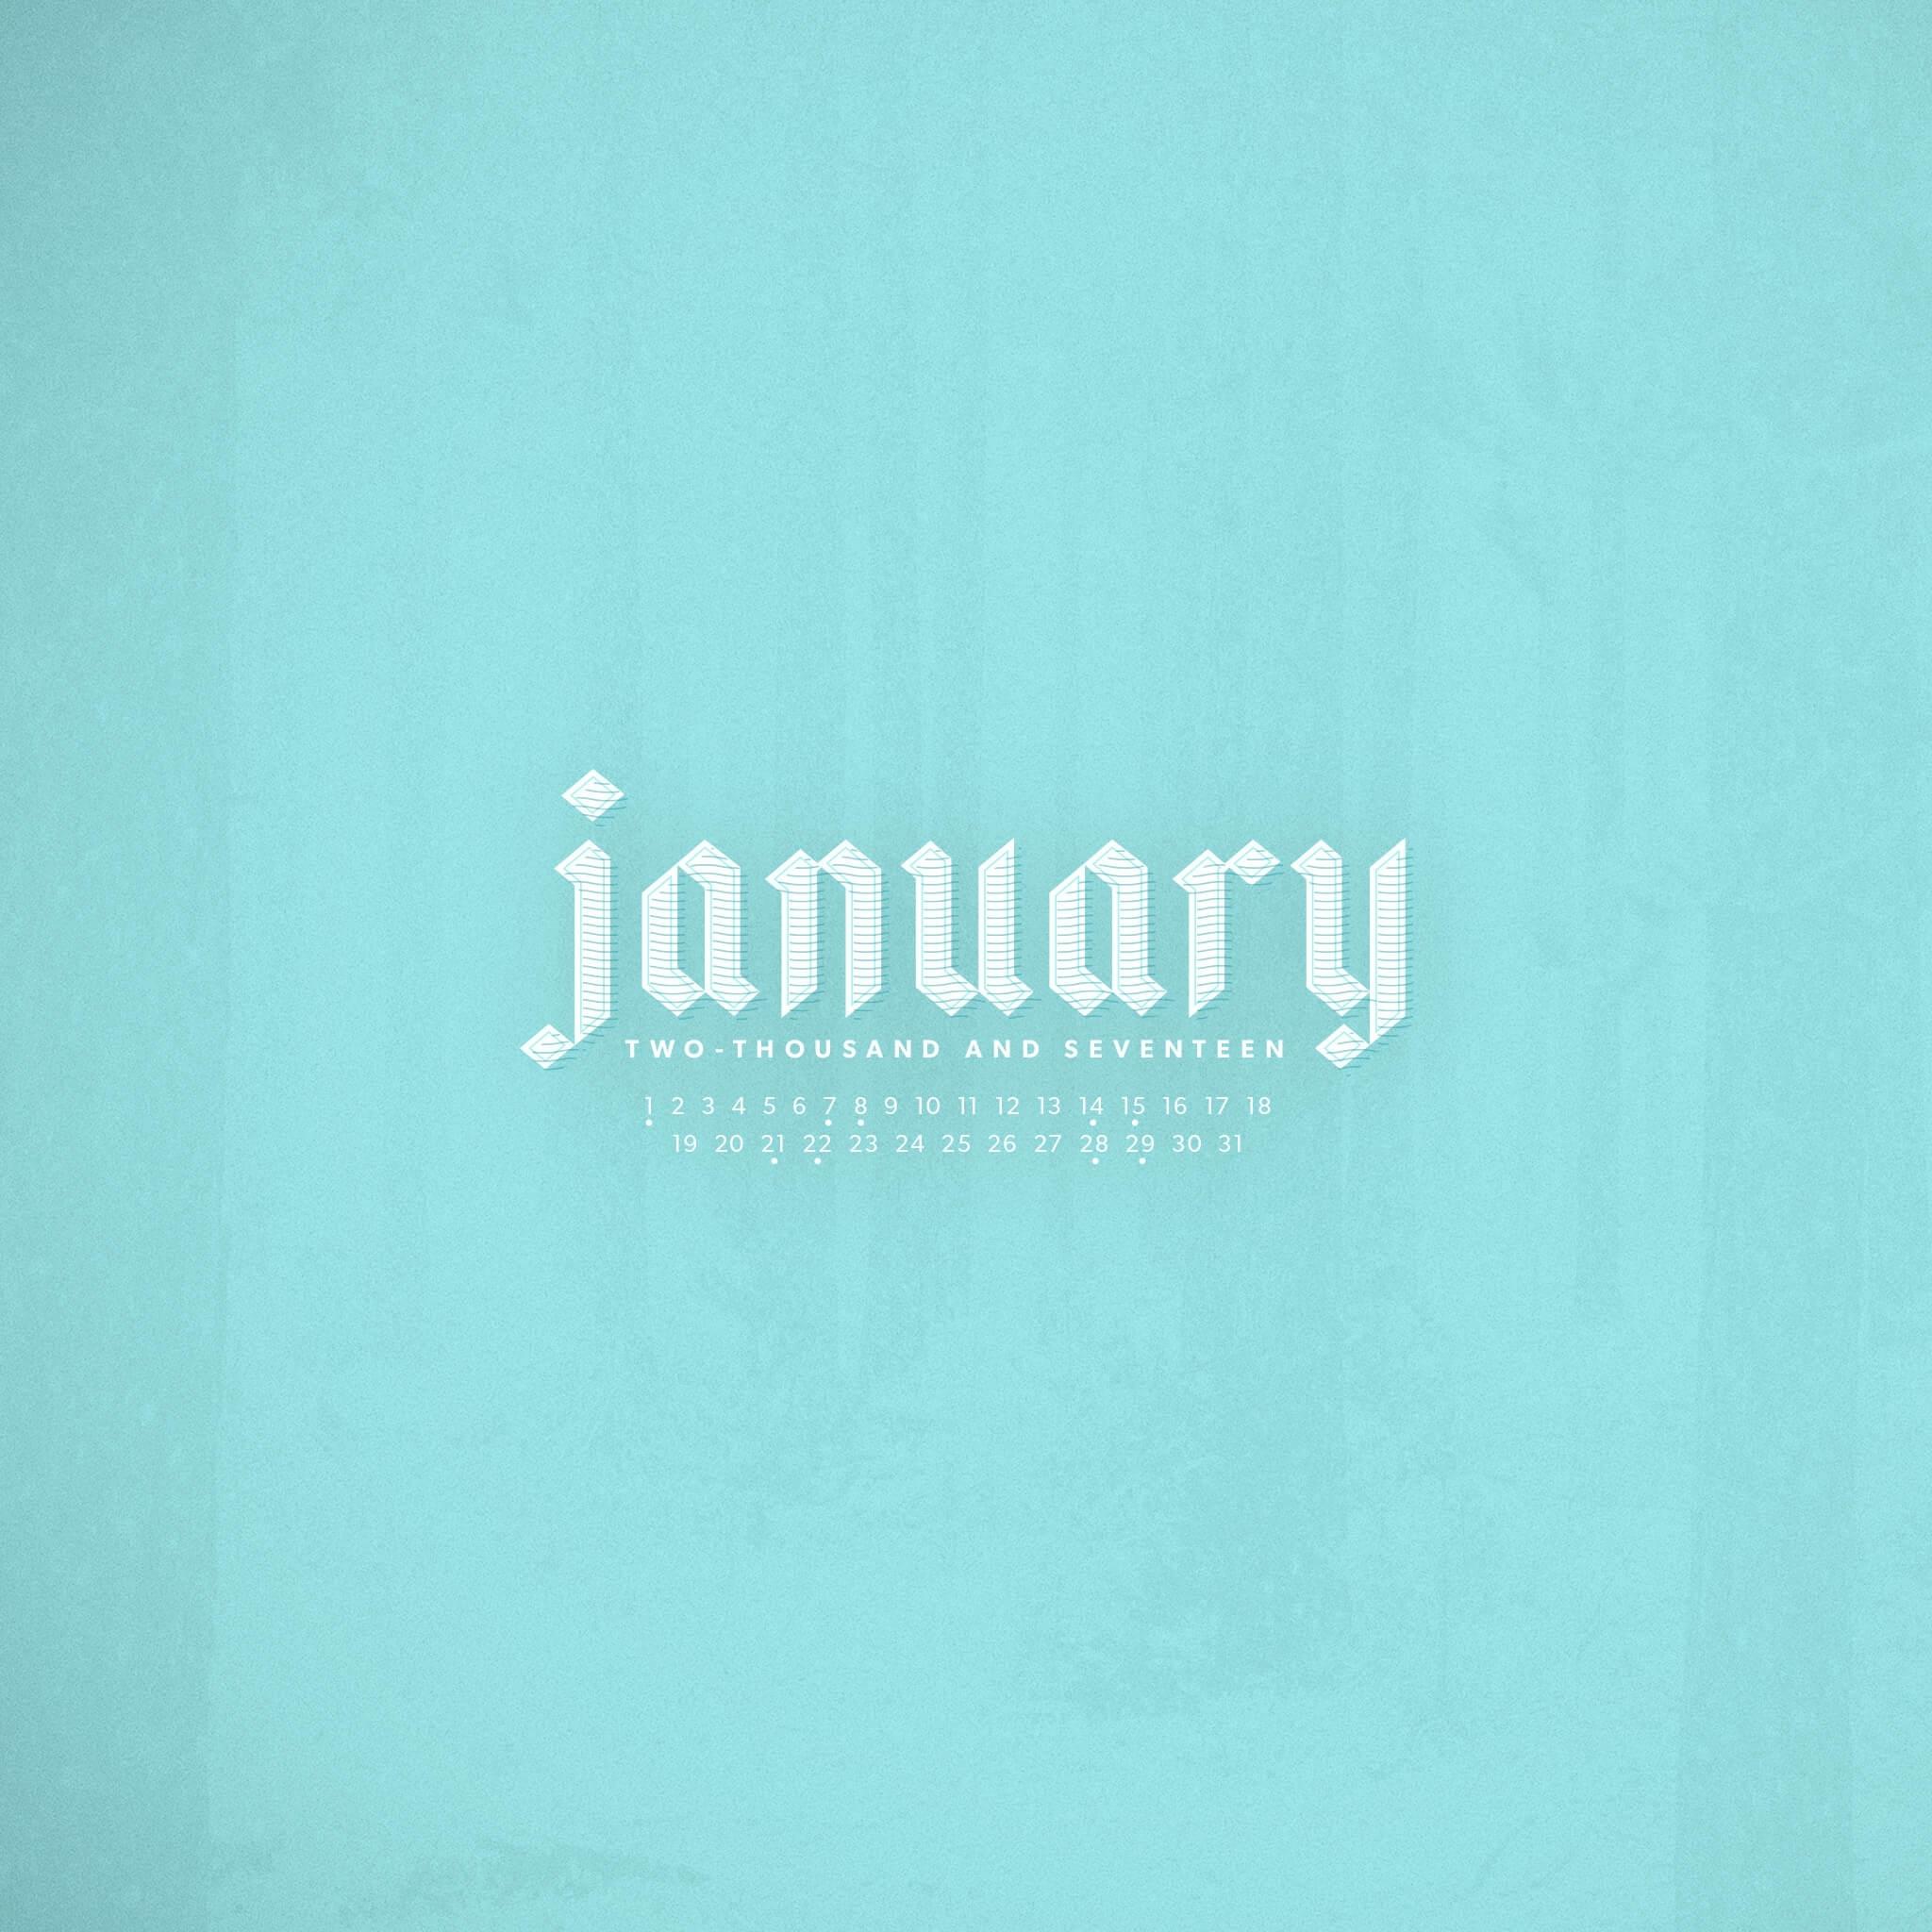 january 2017 desktop calendar wallpaper | paper leaf